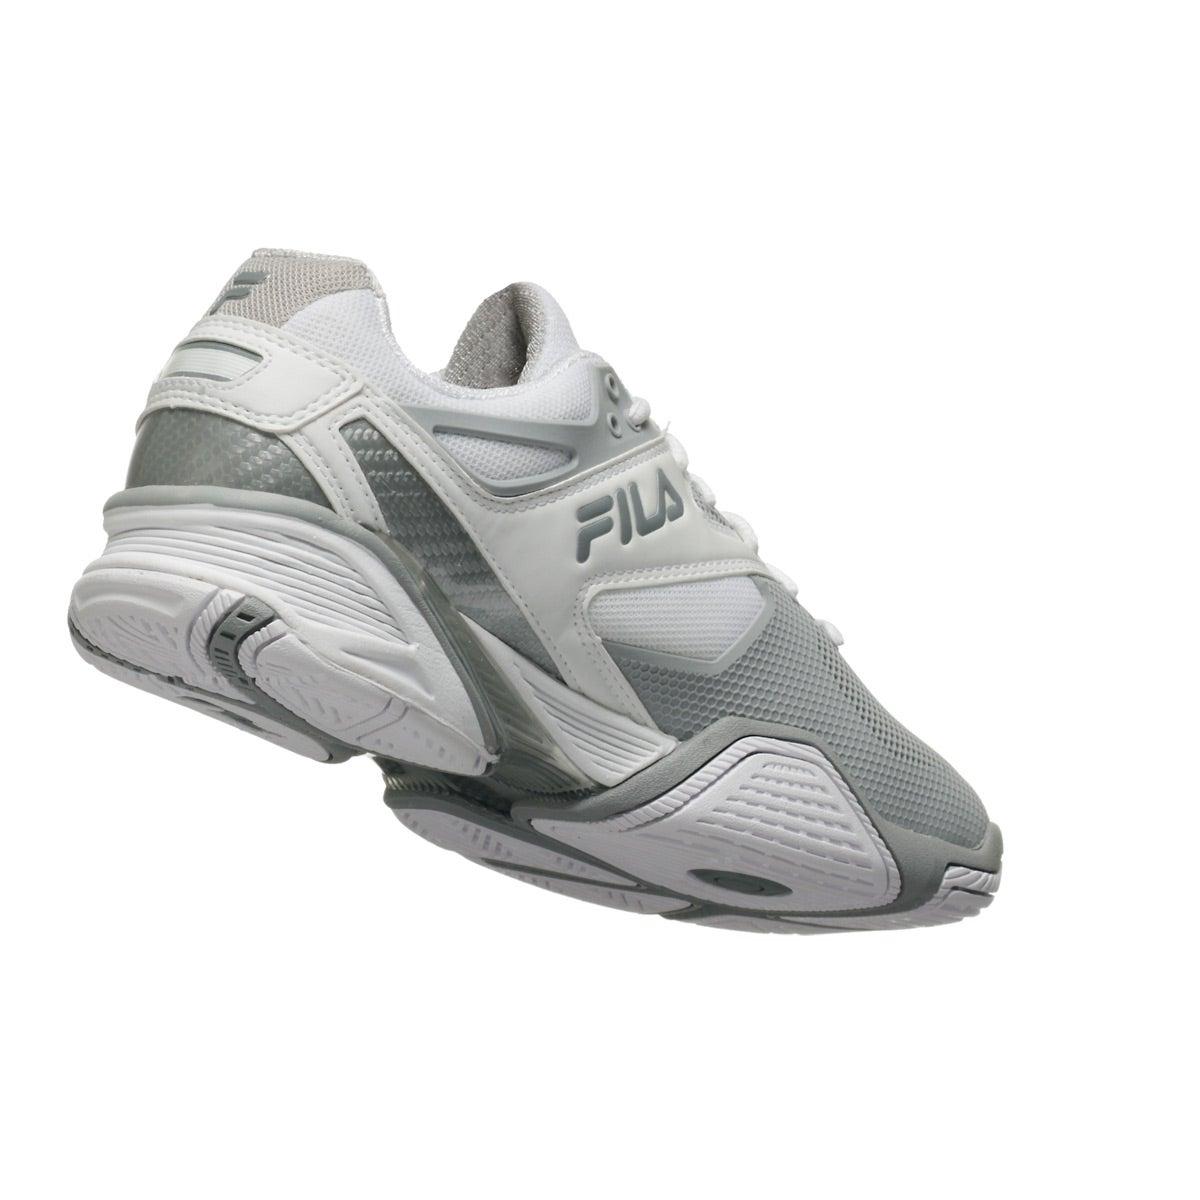 0faea6da38b0 Fila Sentinel White Silver Women s Shoes 360° View